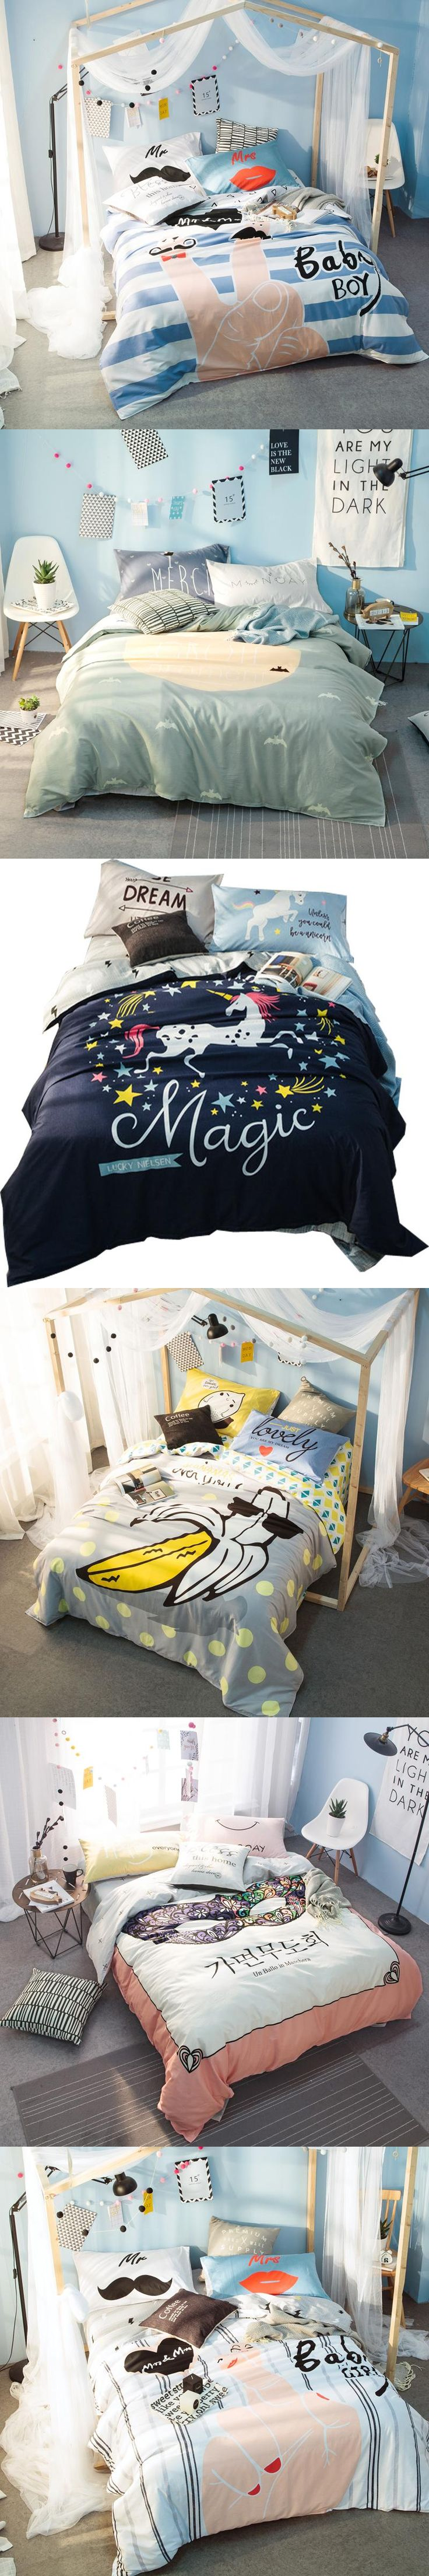 Papa&Mima Cartoon Unicorn Stars Blue Bedding Sets Queen Size Soft Cotton New Bedlinens Duvet Cover Sets Flat Sheet Pillow Cases